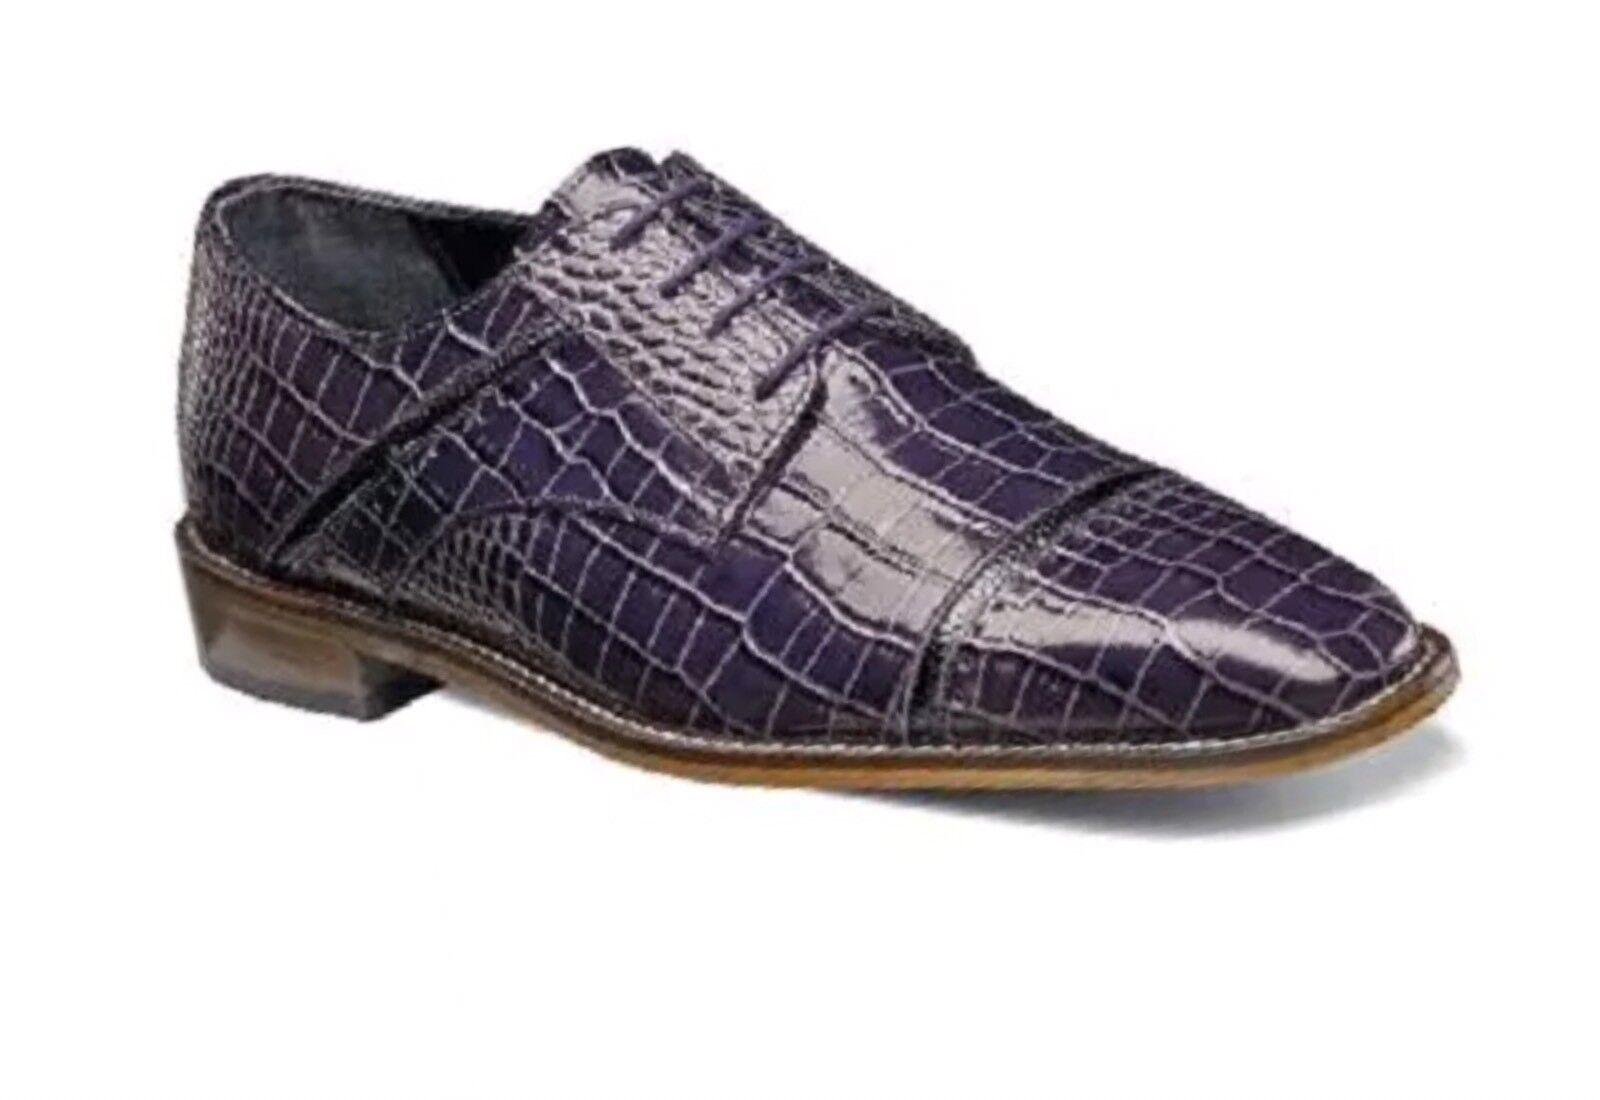 Stacy Adams Raimondo chaussures Homme Prune noir Multi Imprimé Cuir 25115-545